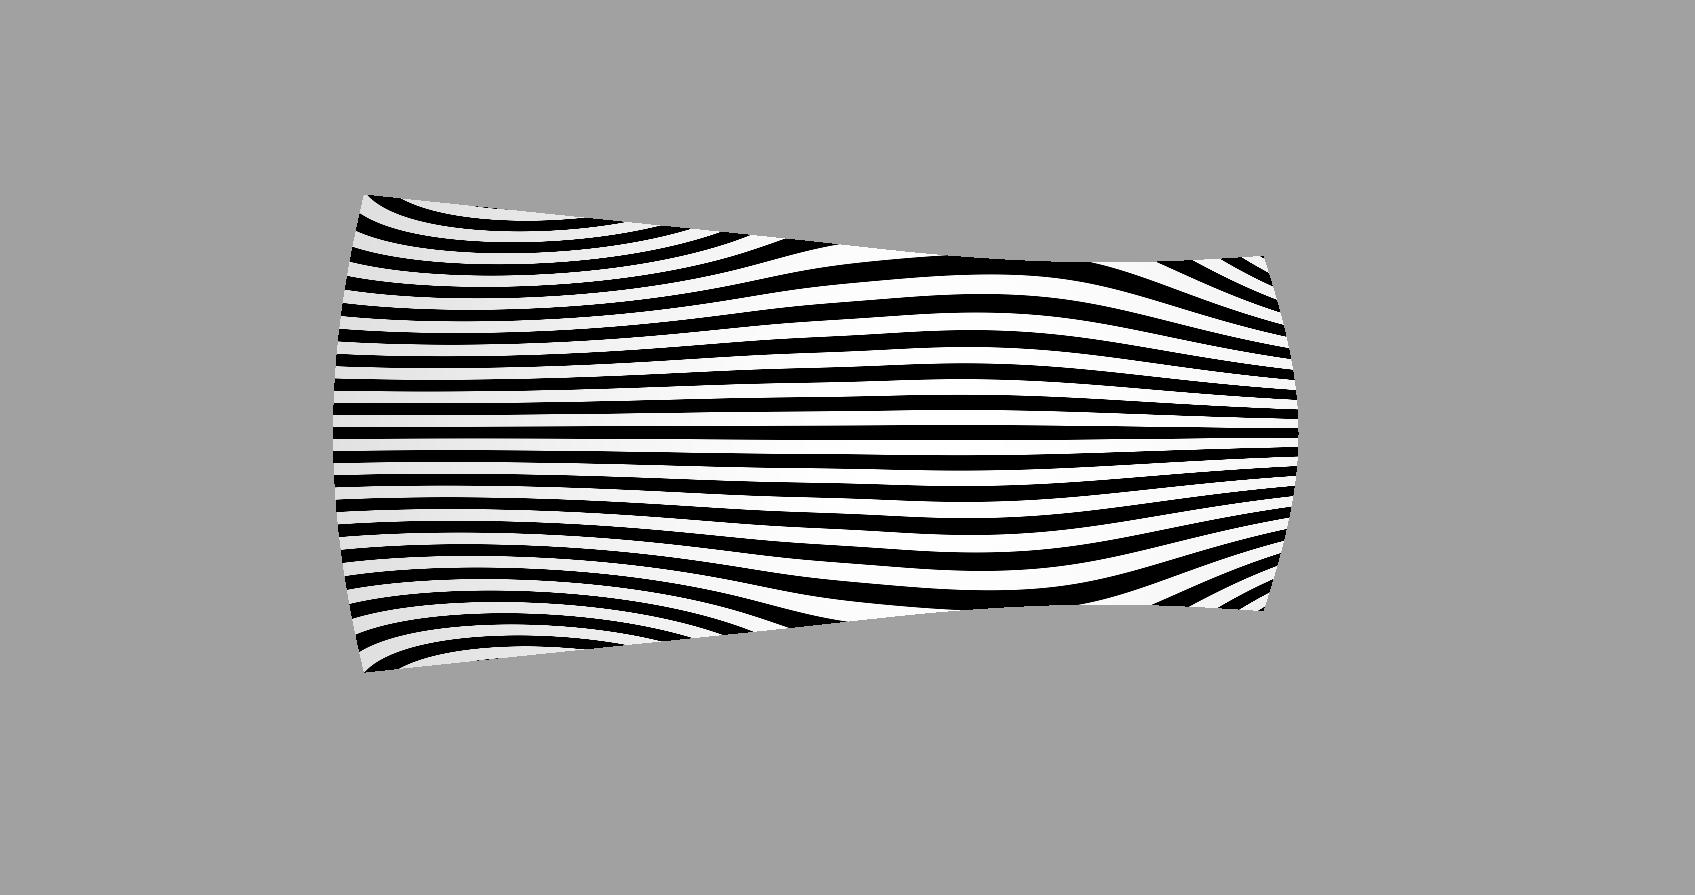 2020-06-09 (28)